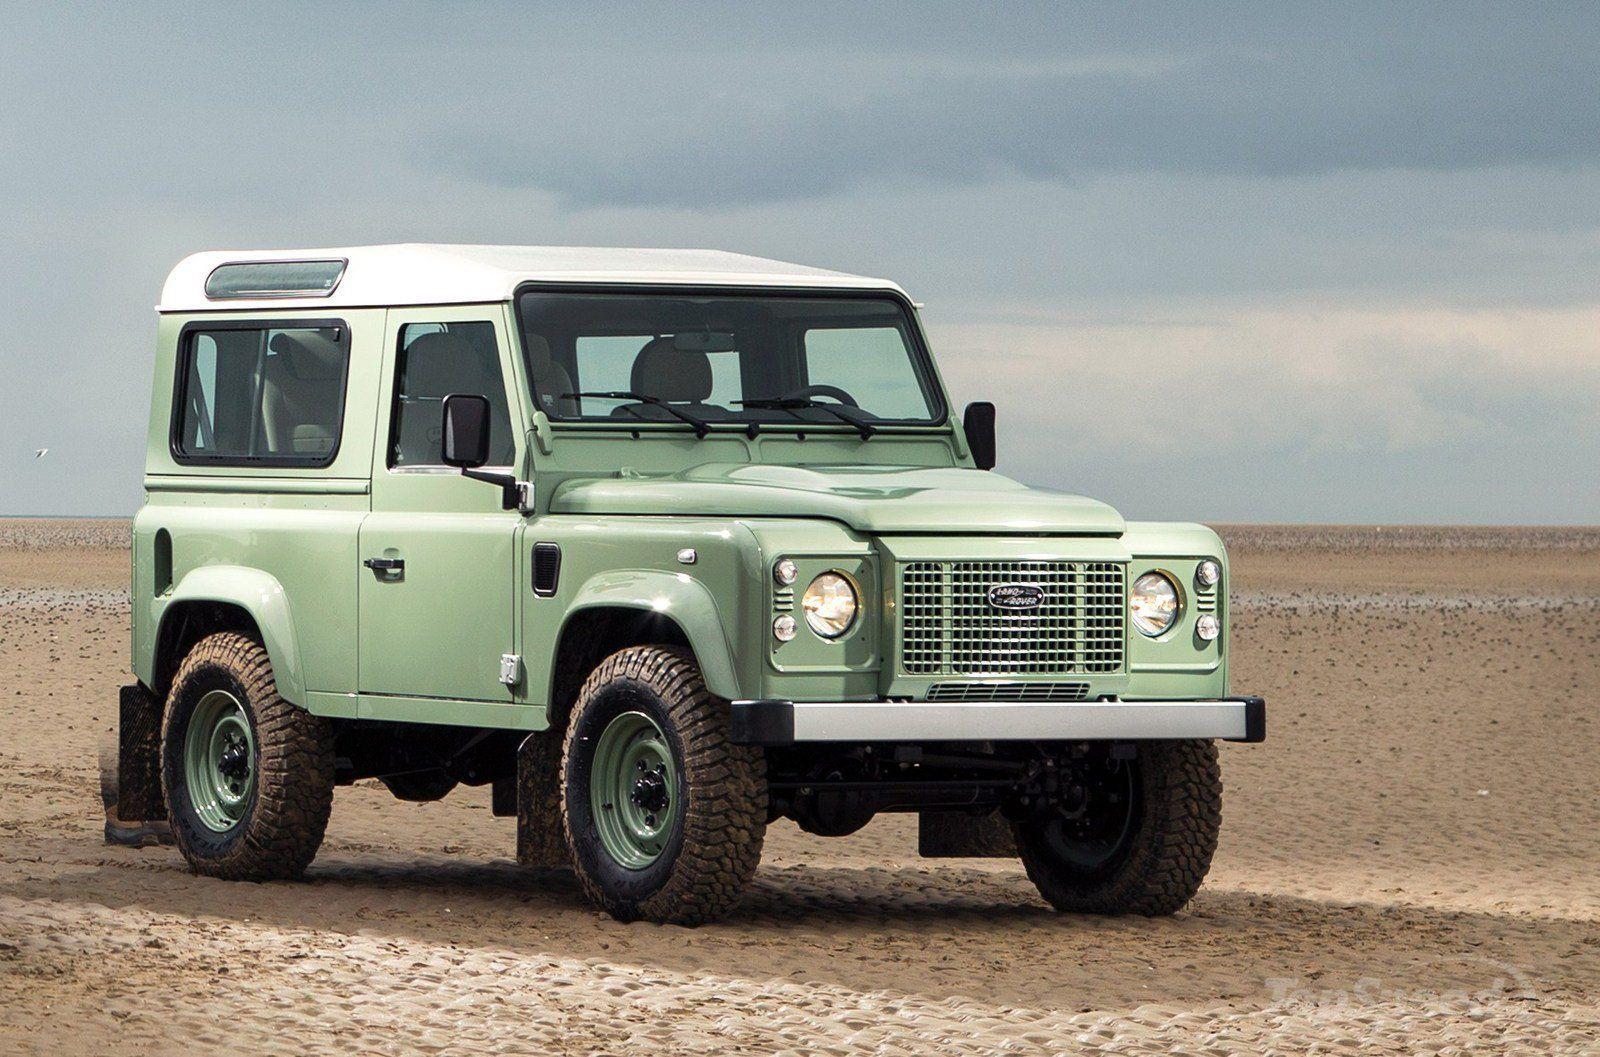 2015 Land Rover Defender Heritage Edition Gallery 609167